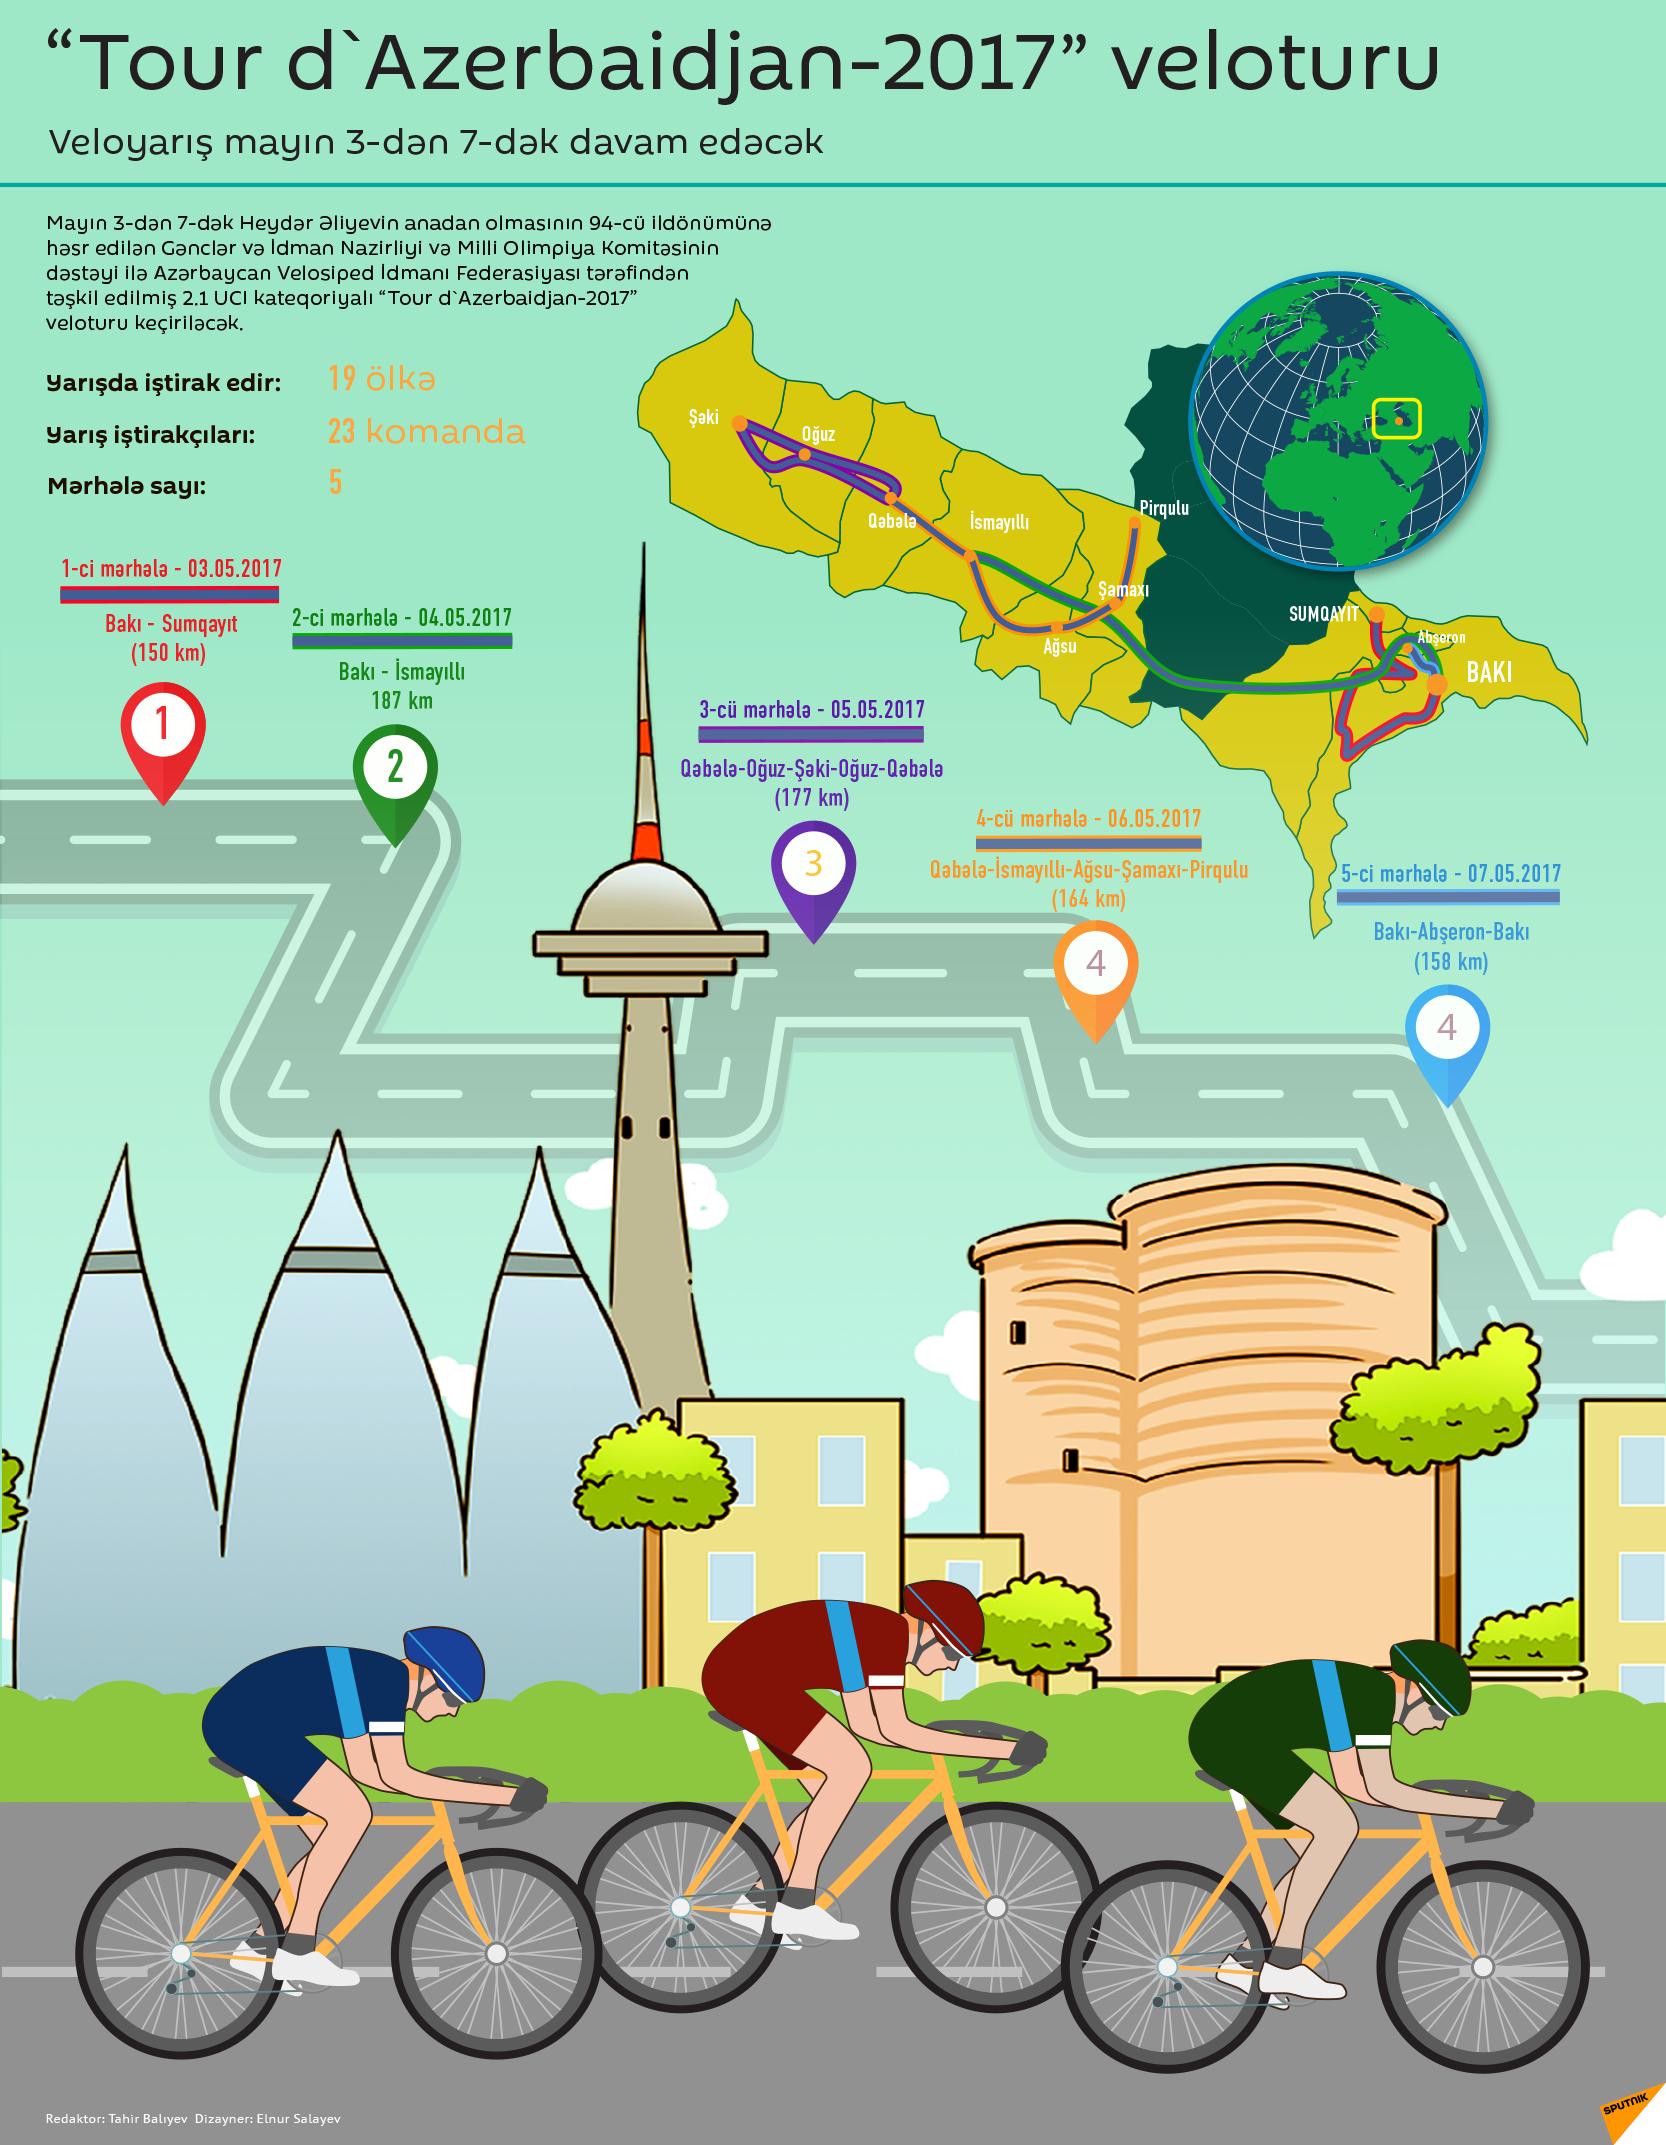 Tour d'Azerbaidjan-2017 veloturu